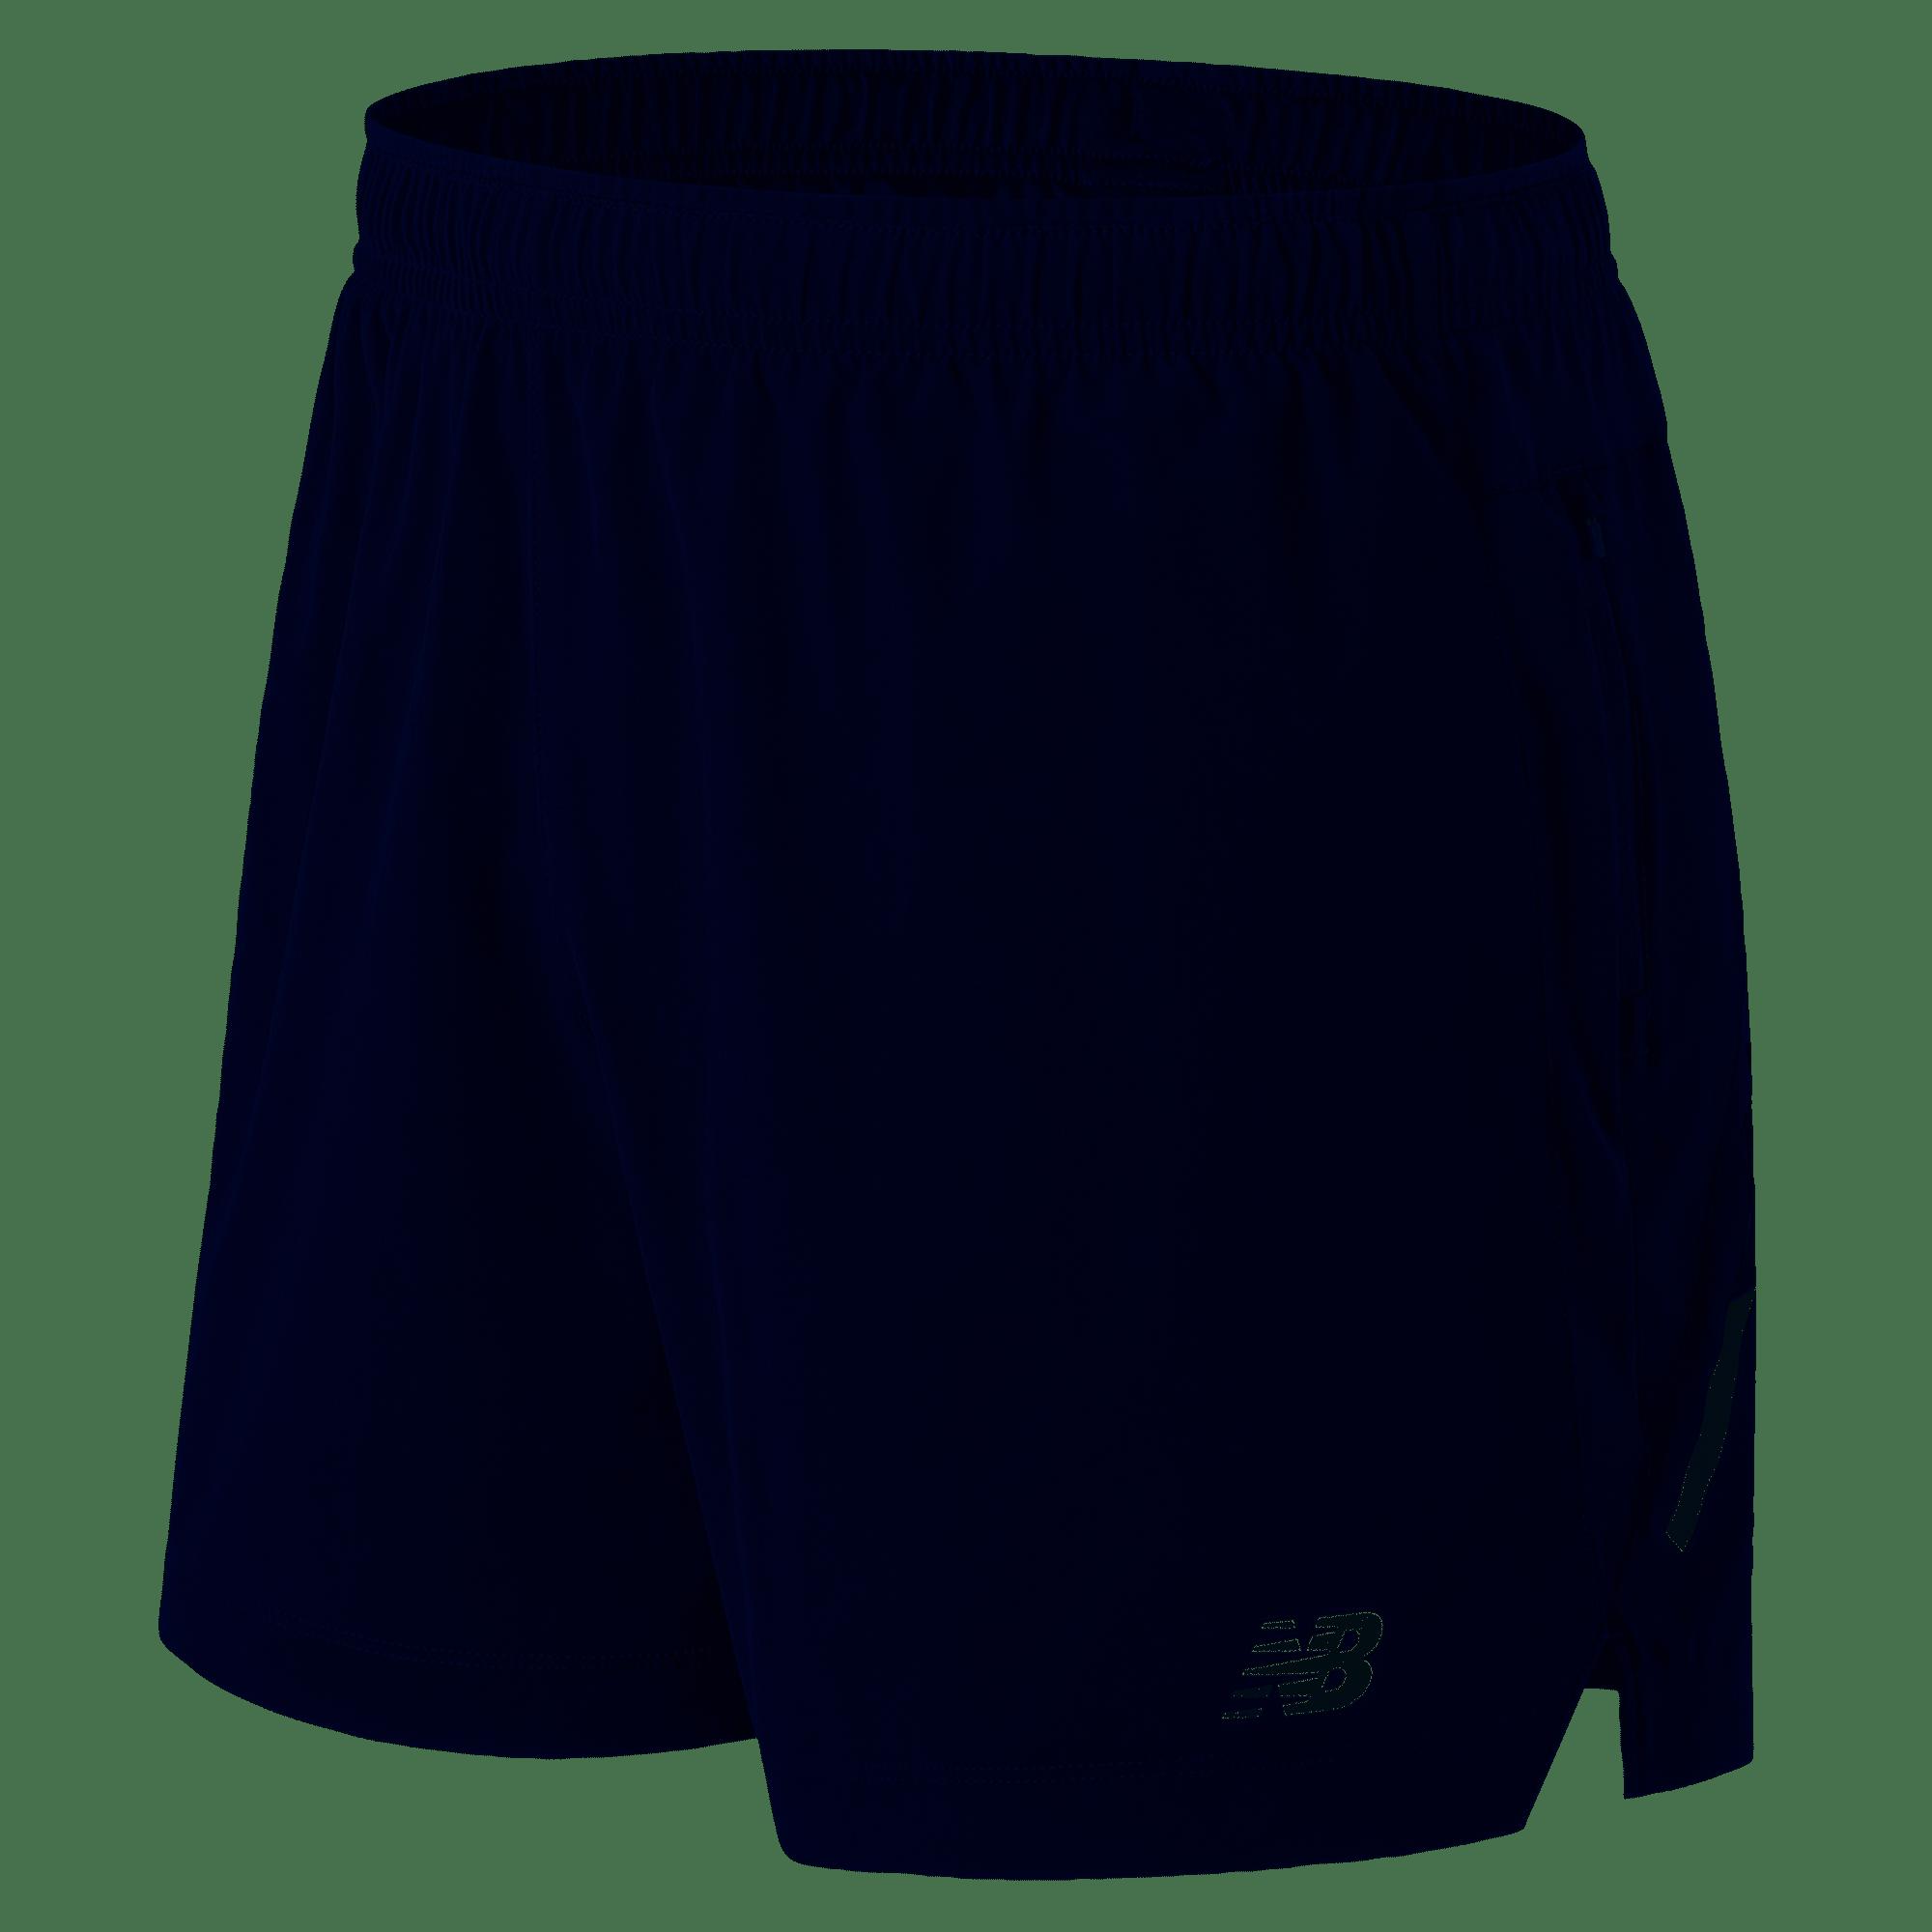 c4354fdd604d6 New Balance Mens Impact 5 Inch Shorts, Navy - Gannon Sports